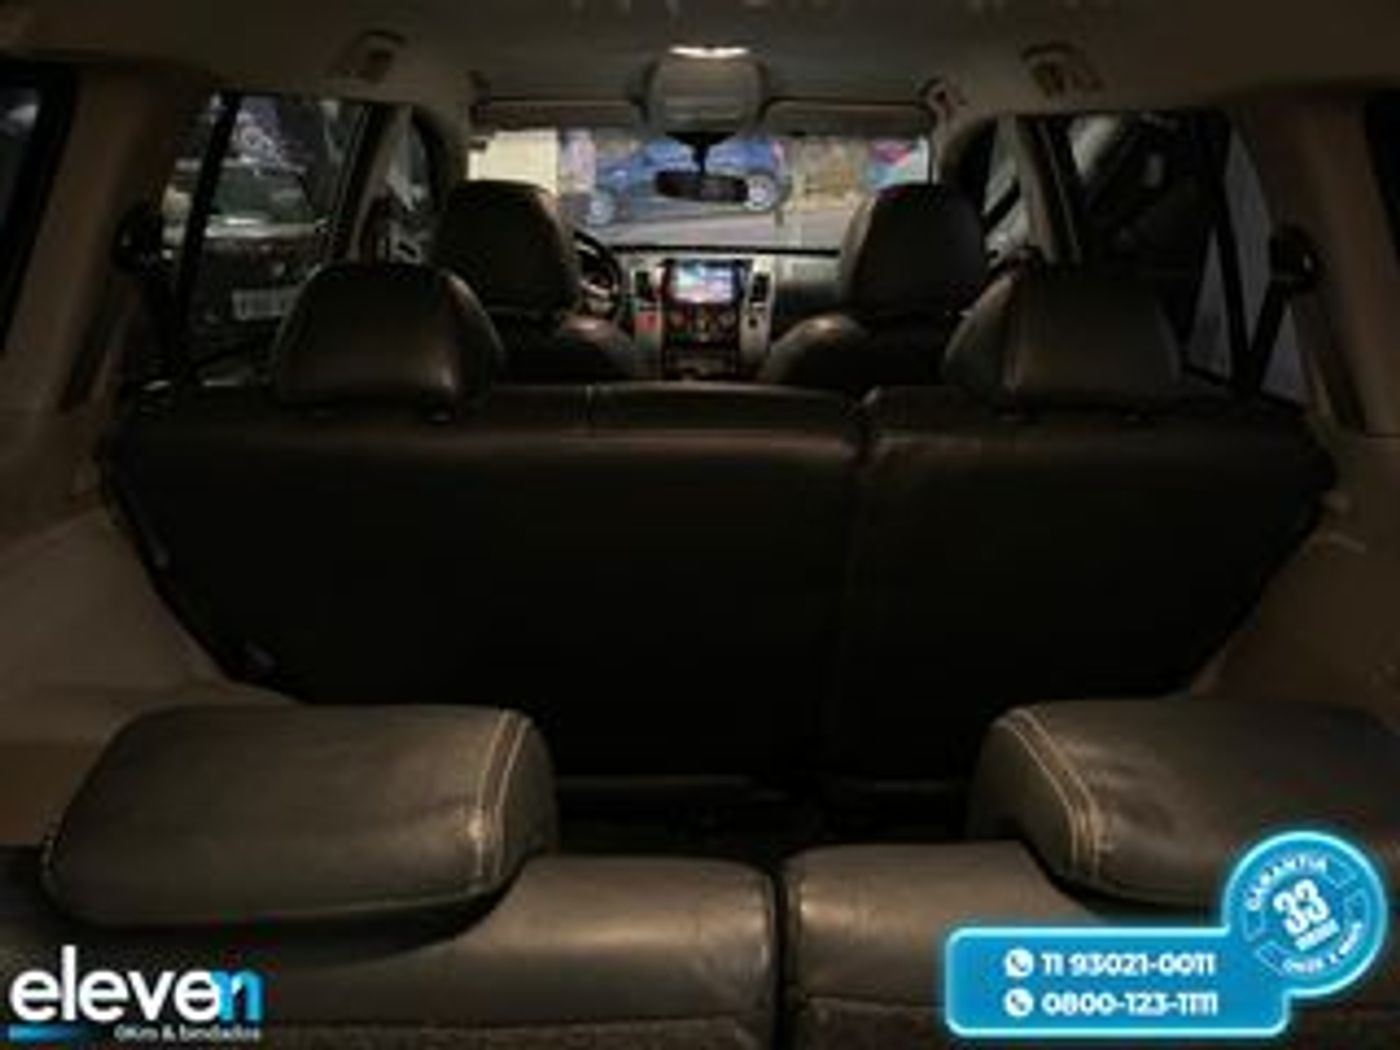 Mitsubishi Pajero DAKAR HPE 3.2 4x4 T.I Dies 5p Aut